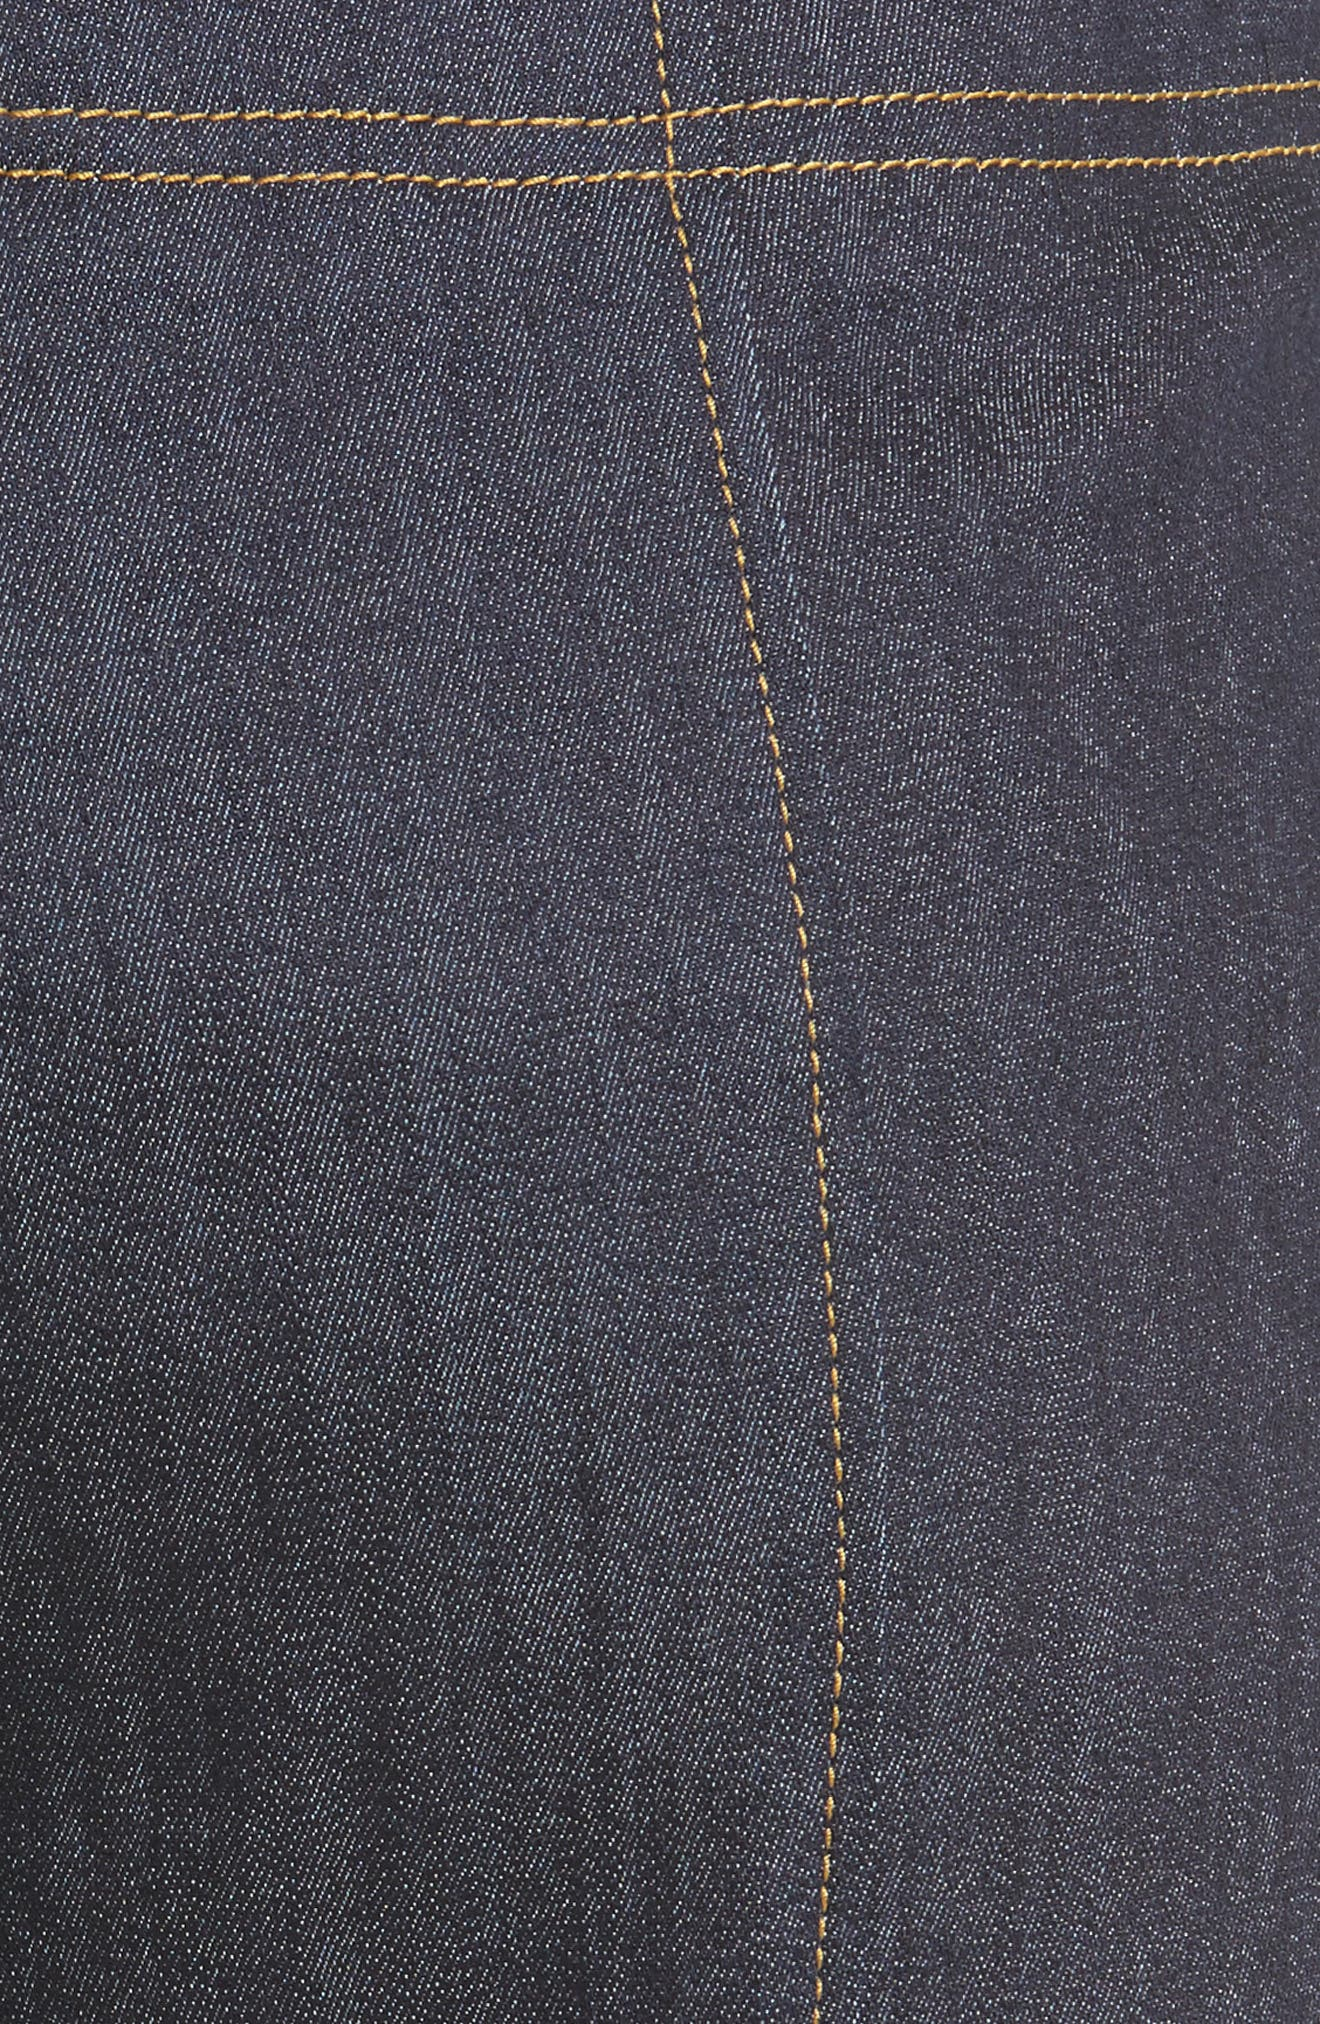 Marla Cuff Jeans,                             Alternate thumbnail 5, color,                             422